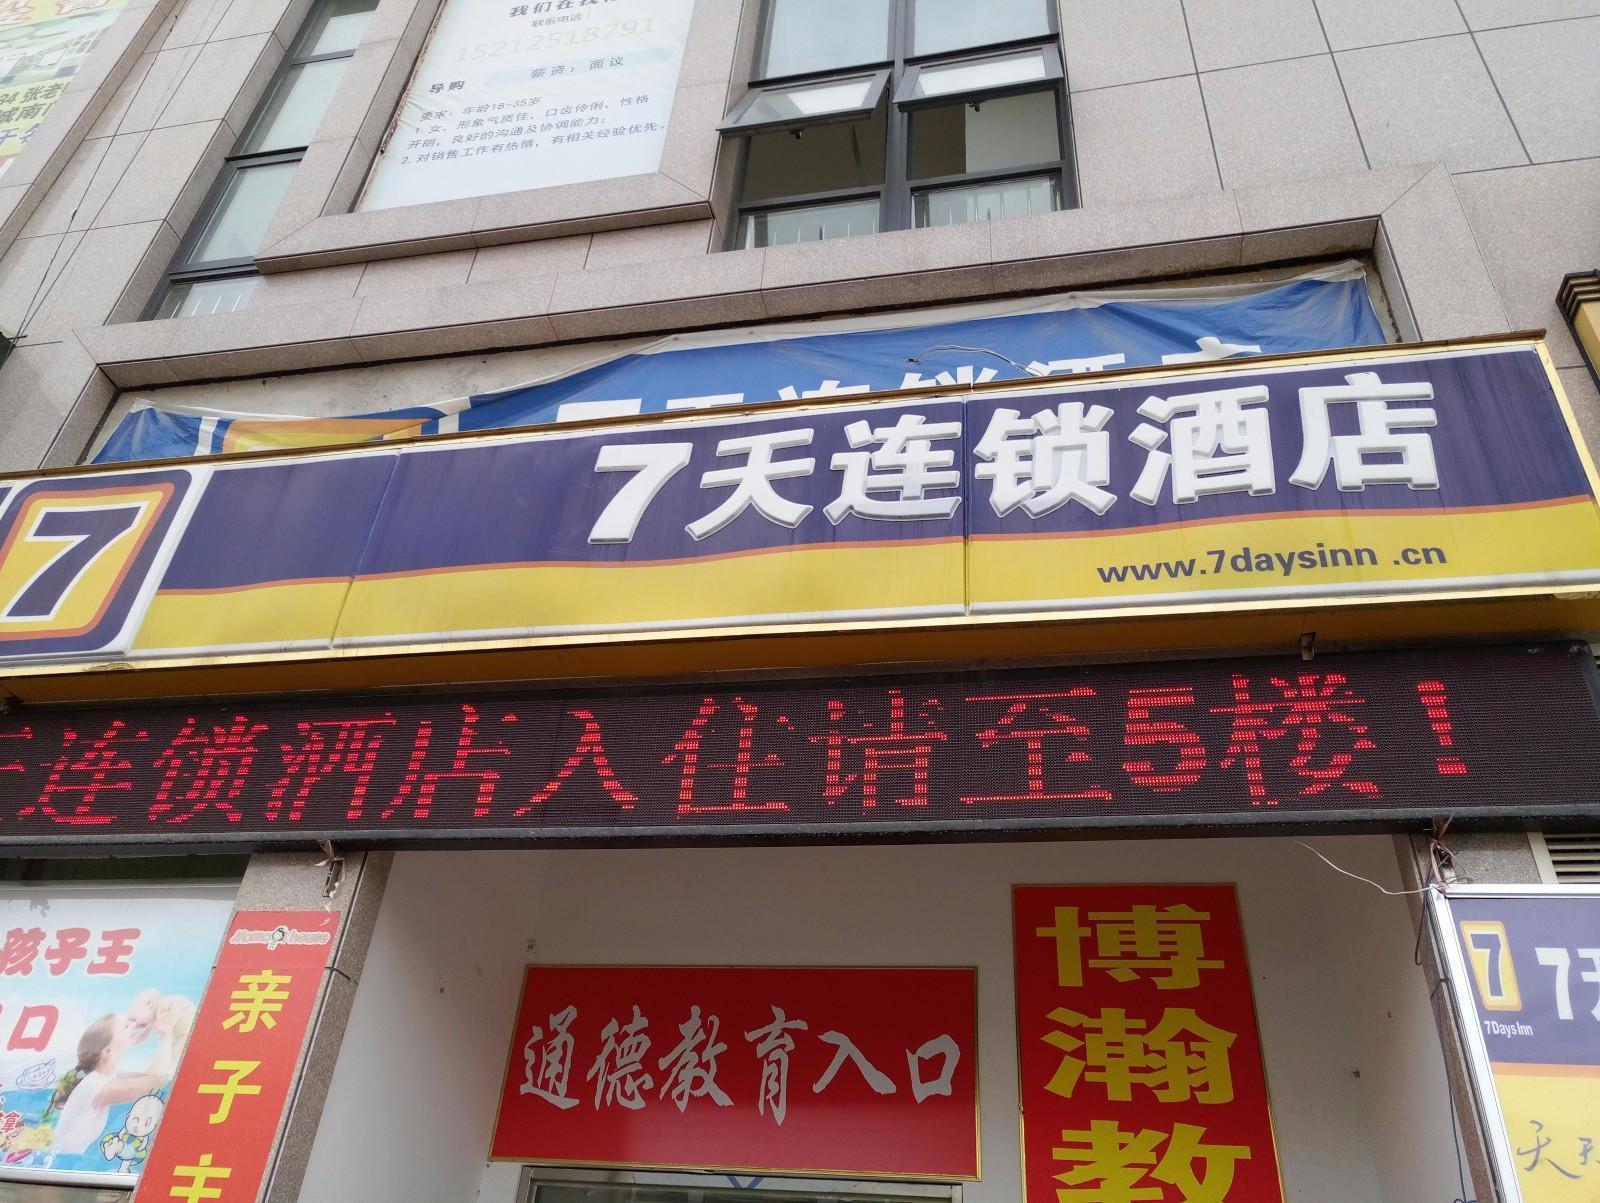 7 Days Inn�Suzhou Dangshan Oriental Ever Bright City